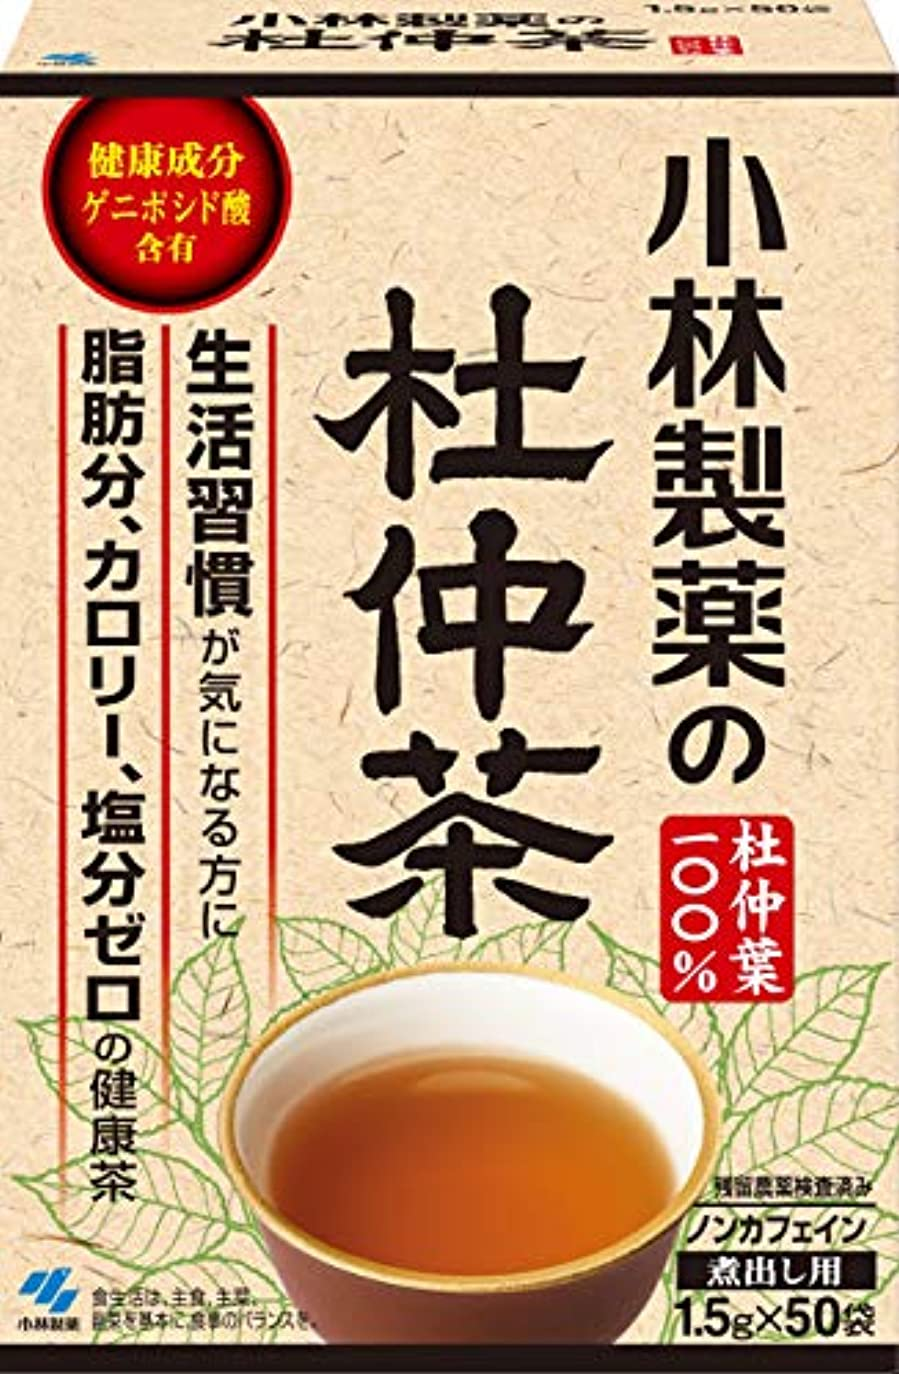 東継続中慈善小林製薬の杜仲茶 1.5g×50袋